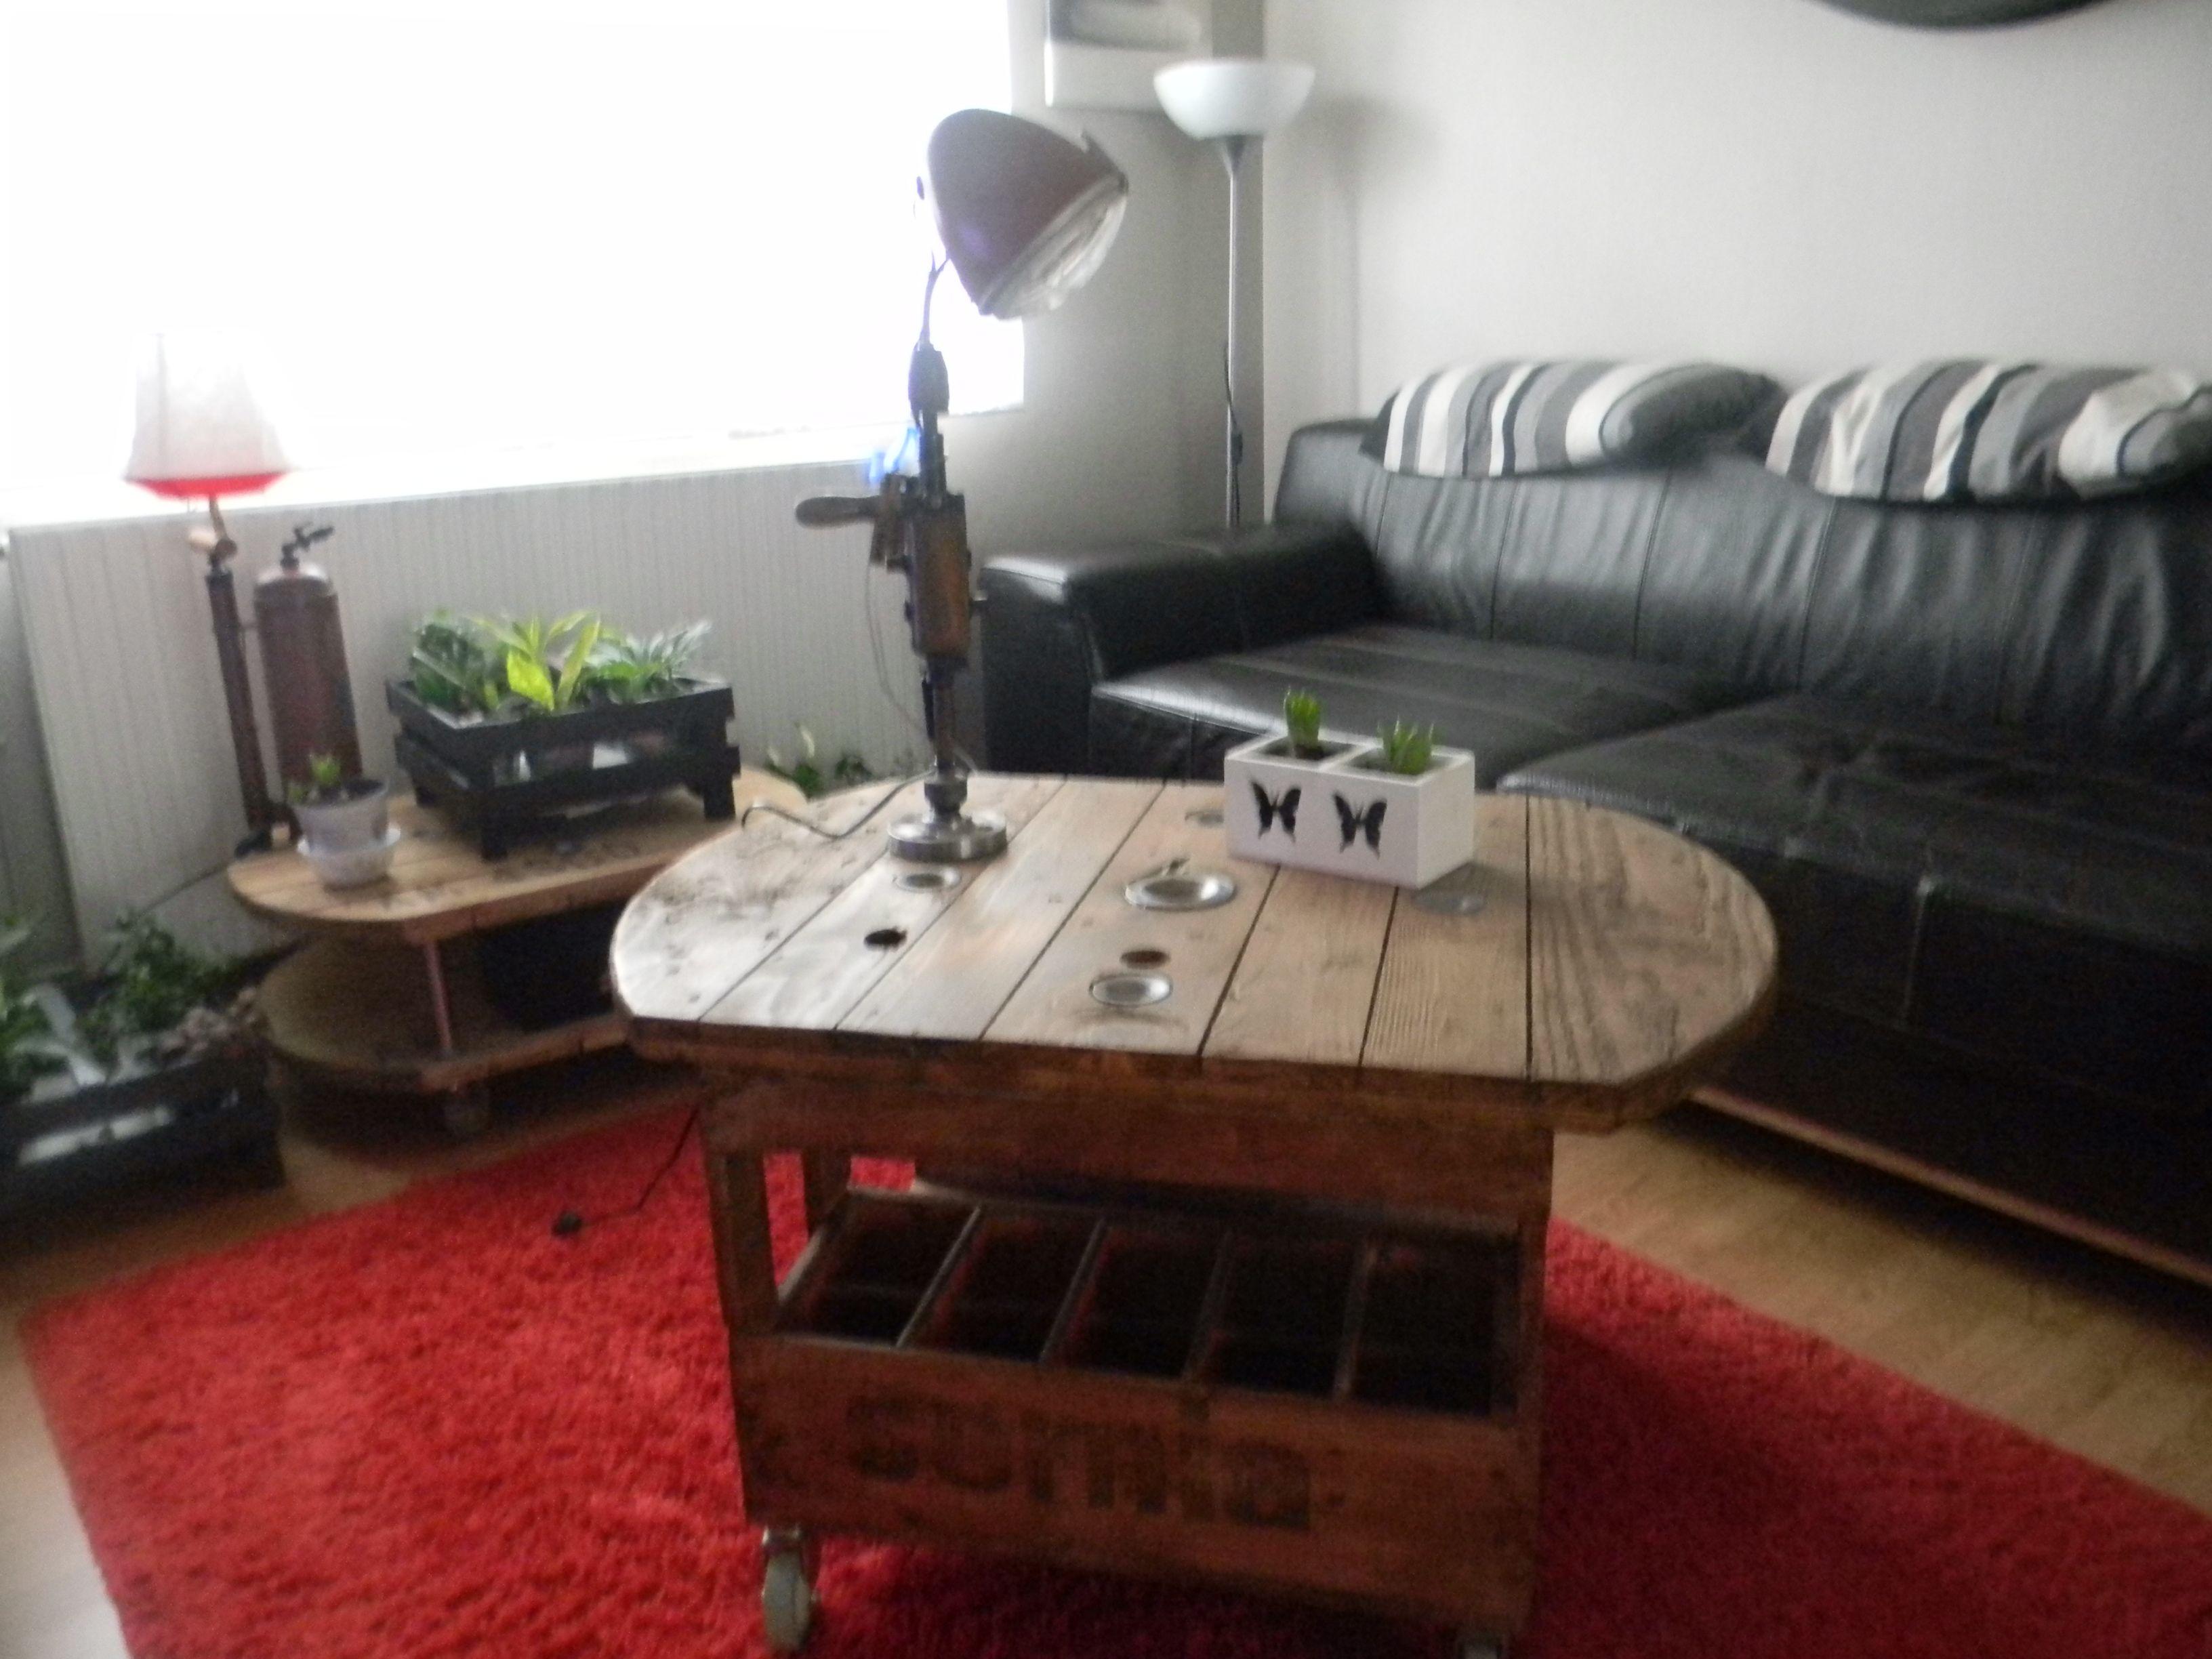 e92494cb6c303b3ee134532e24d991cf Luxe De Mini Table Basse Concept